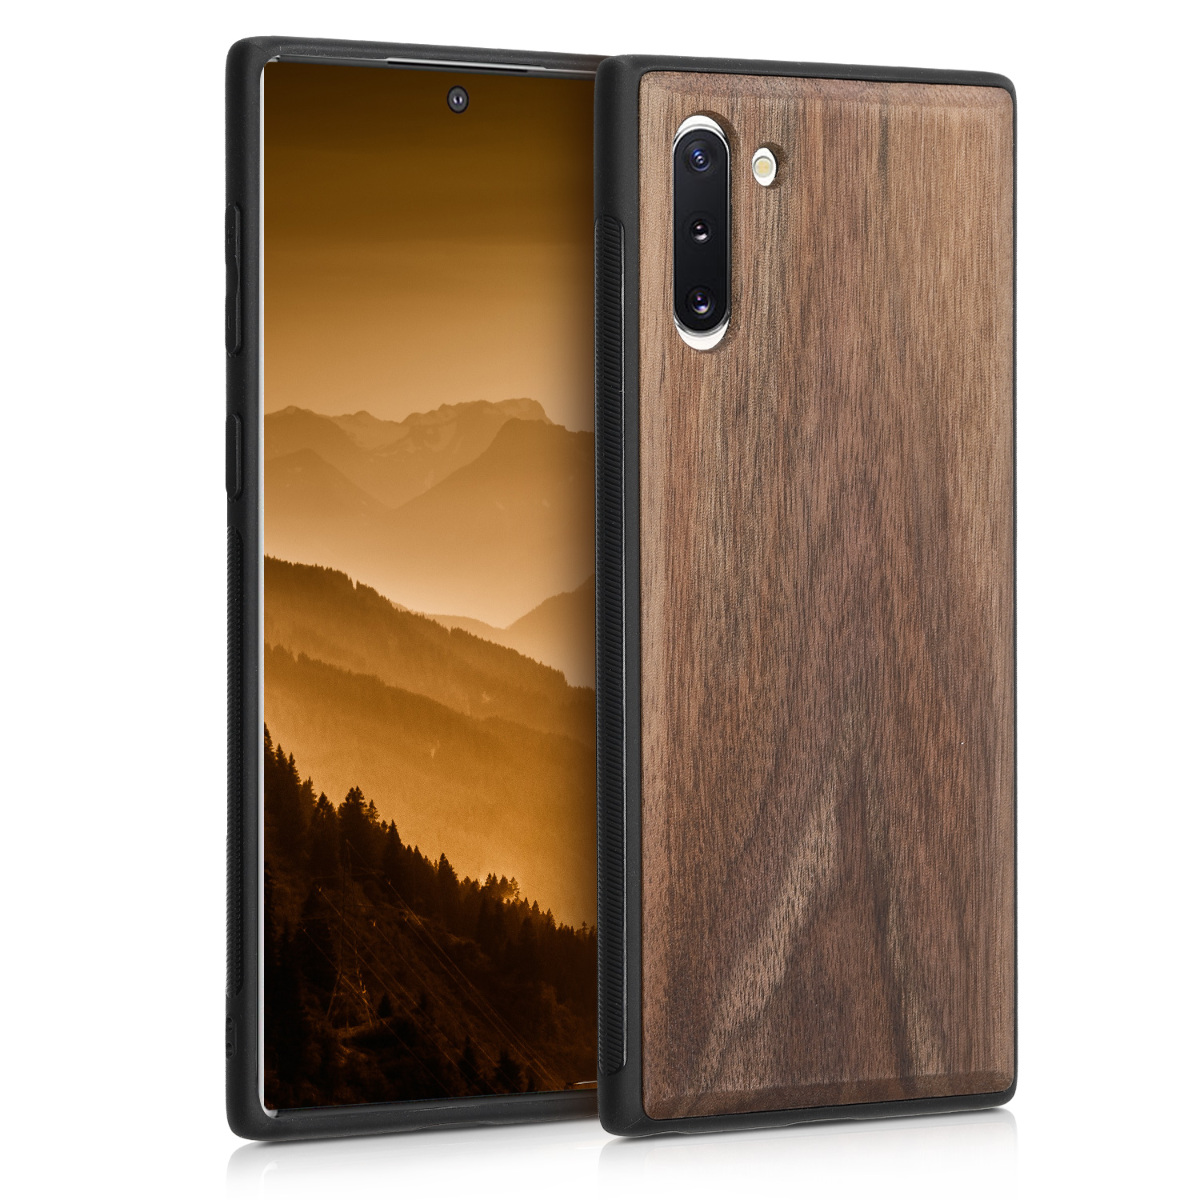 KW Σκληρή Ξύλινη Θήκη Samsung Galaxy Note 10 - Dark Brown (49276.18)